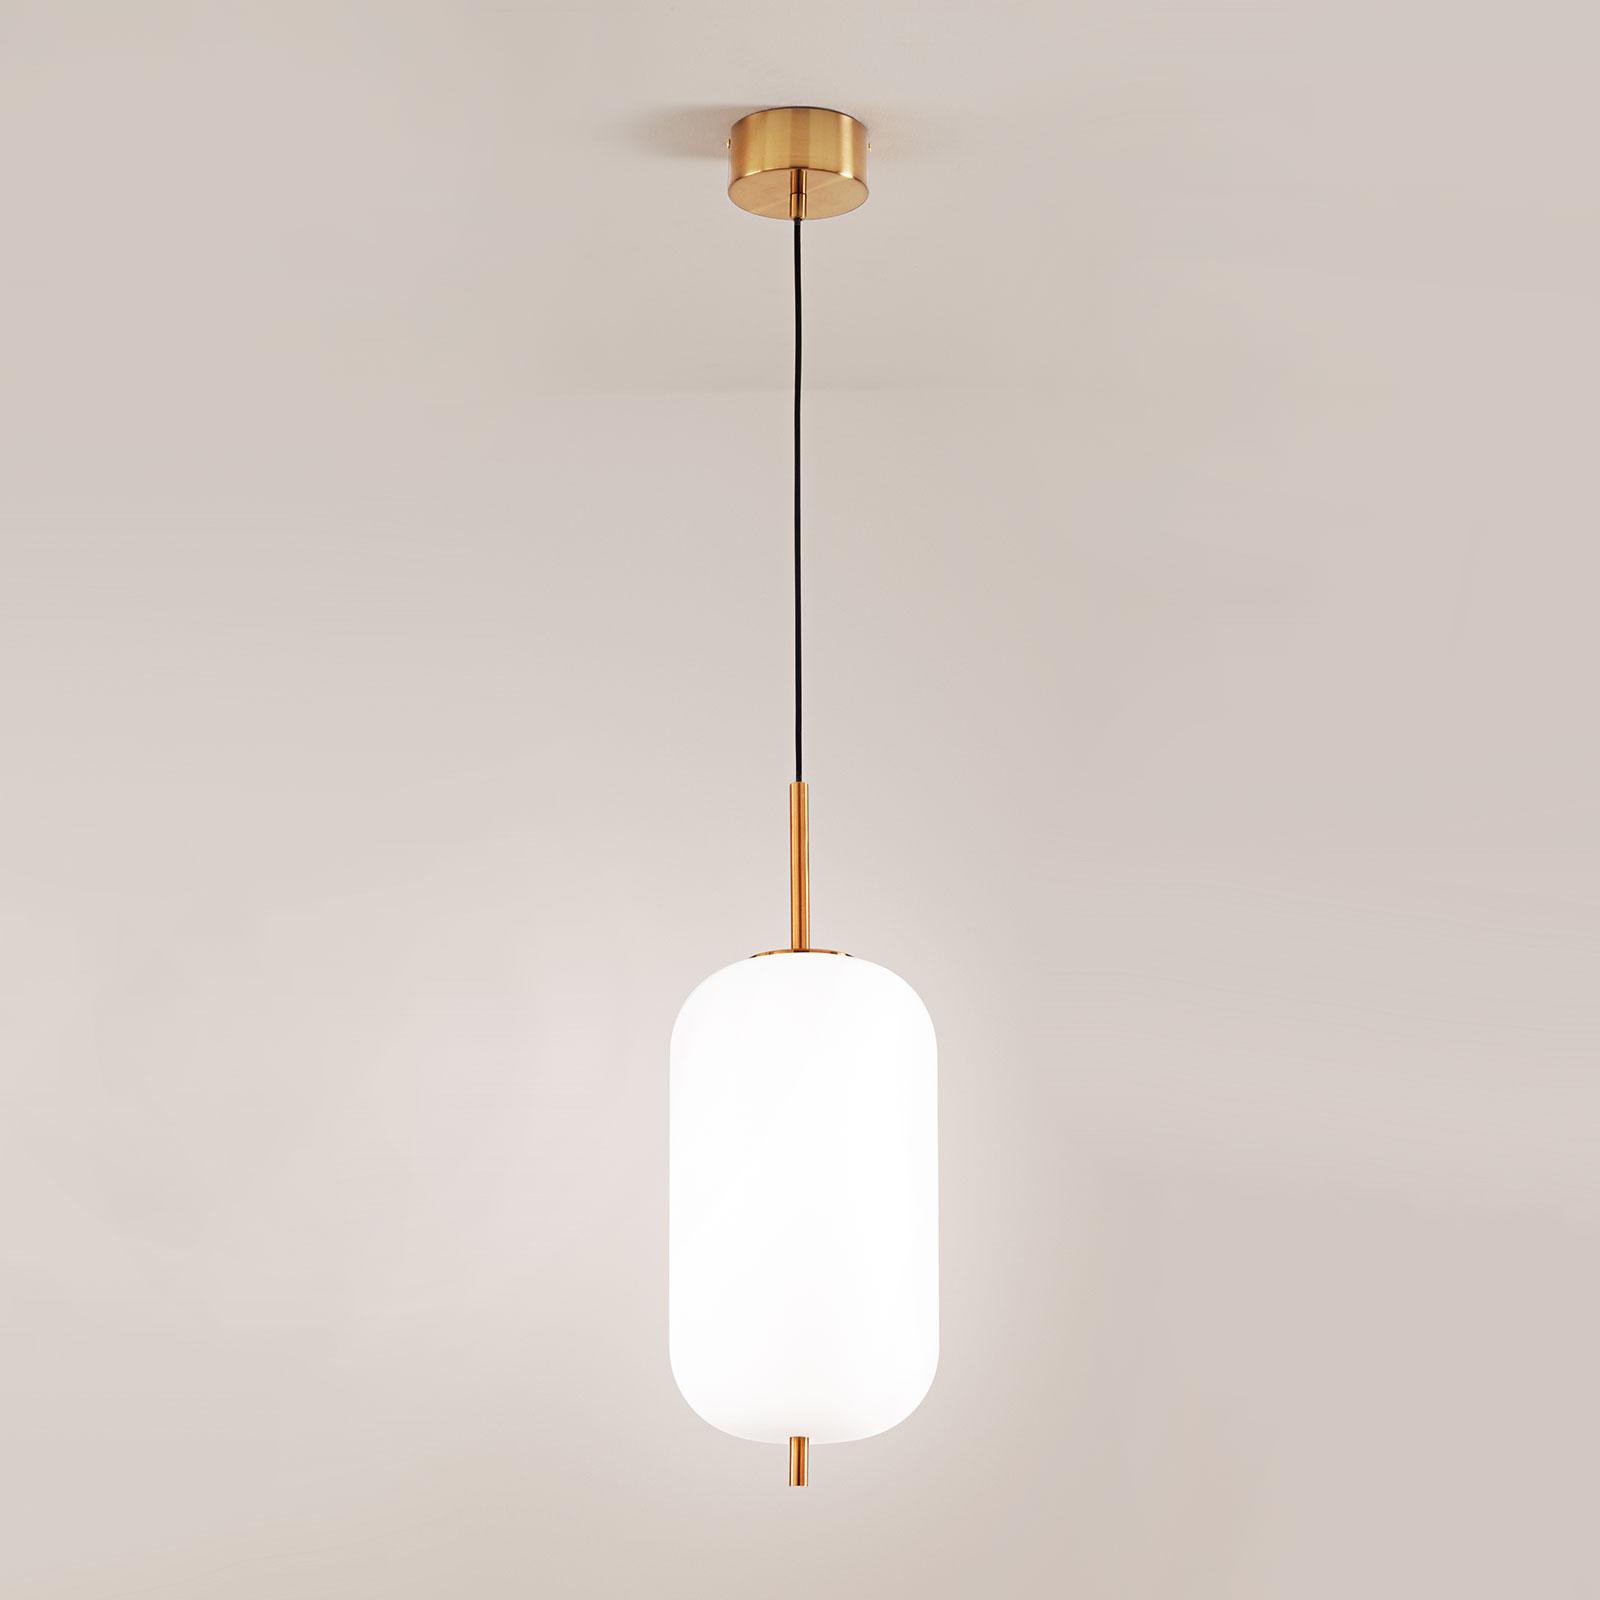 Lampa wisząca LED Cirro Ø 22 cm